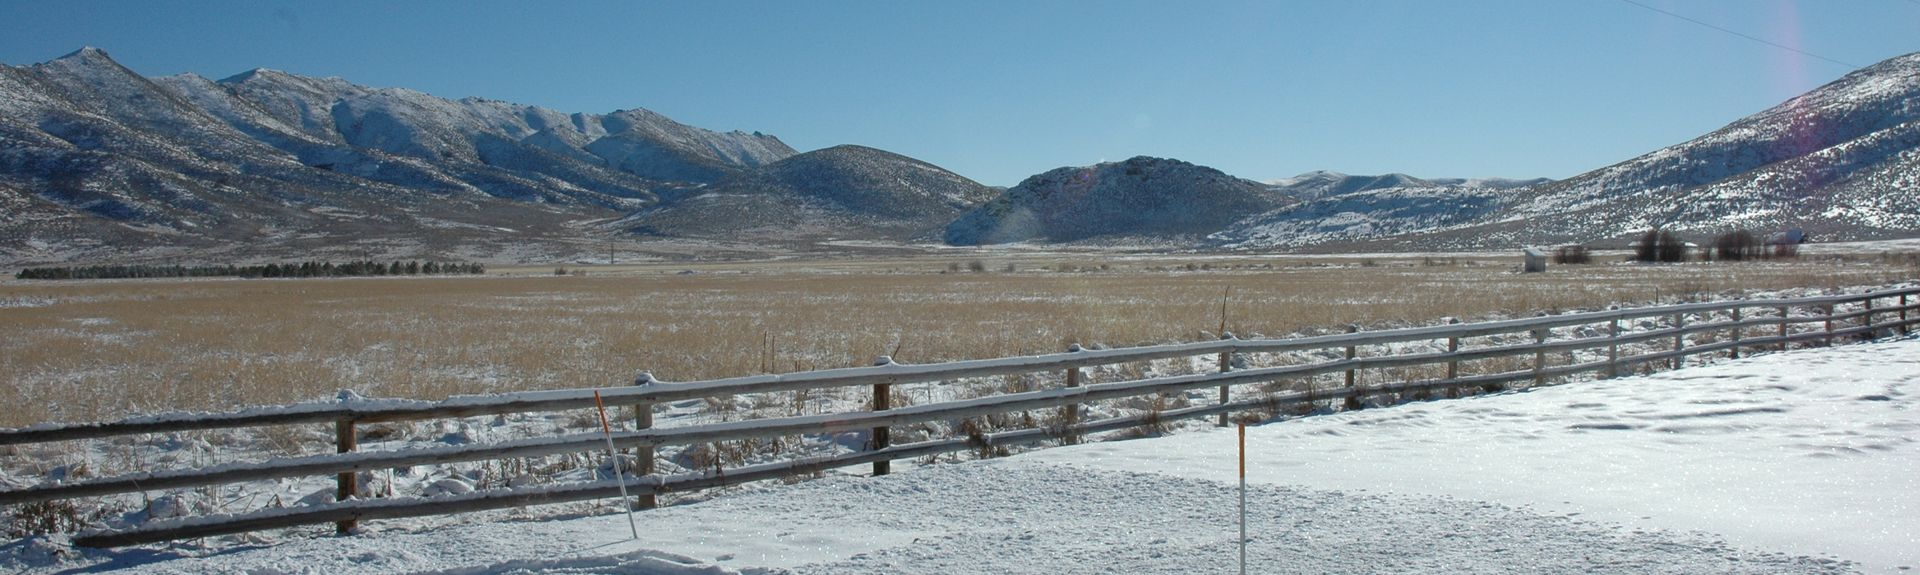 Fairfield, Camas County, Idaho, United States of America